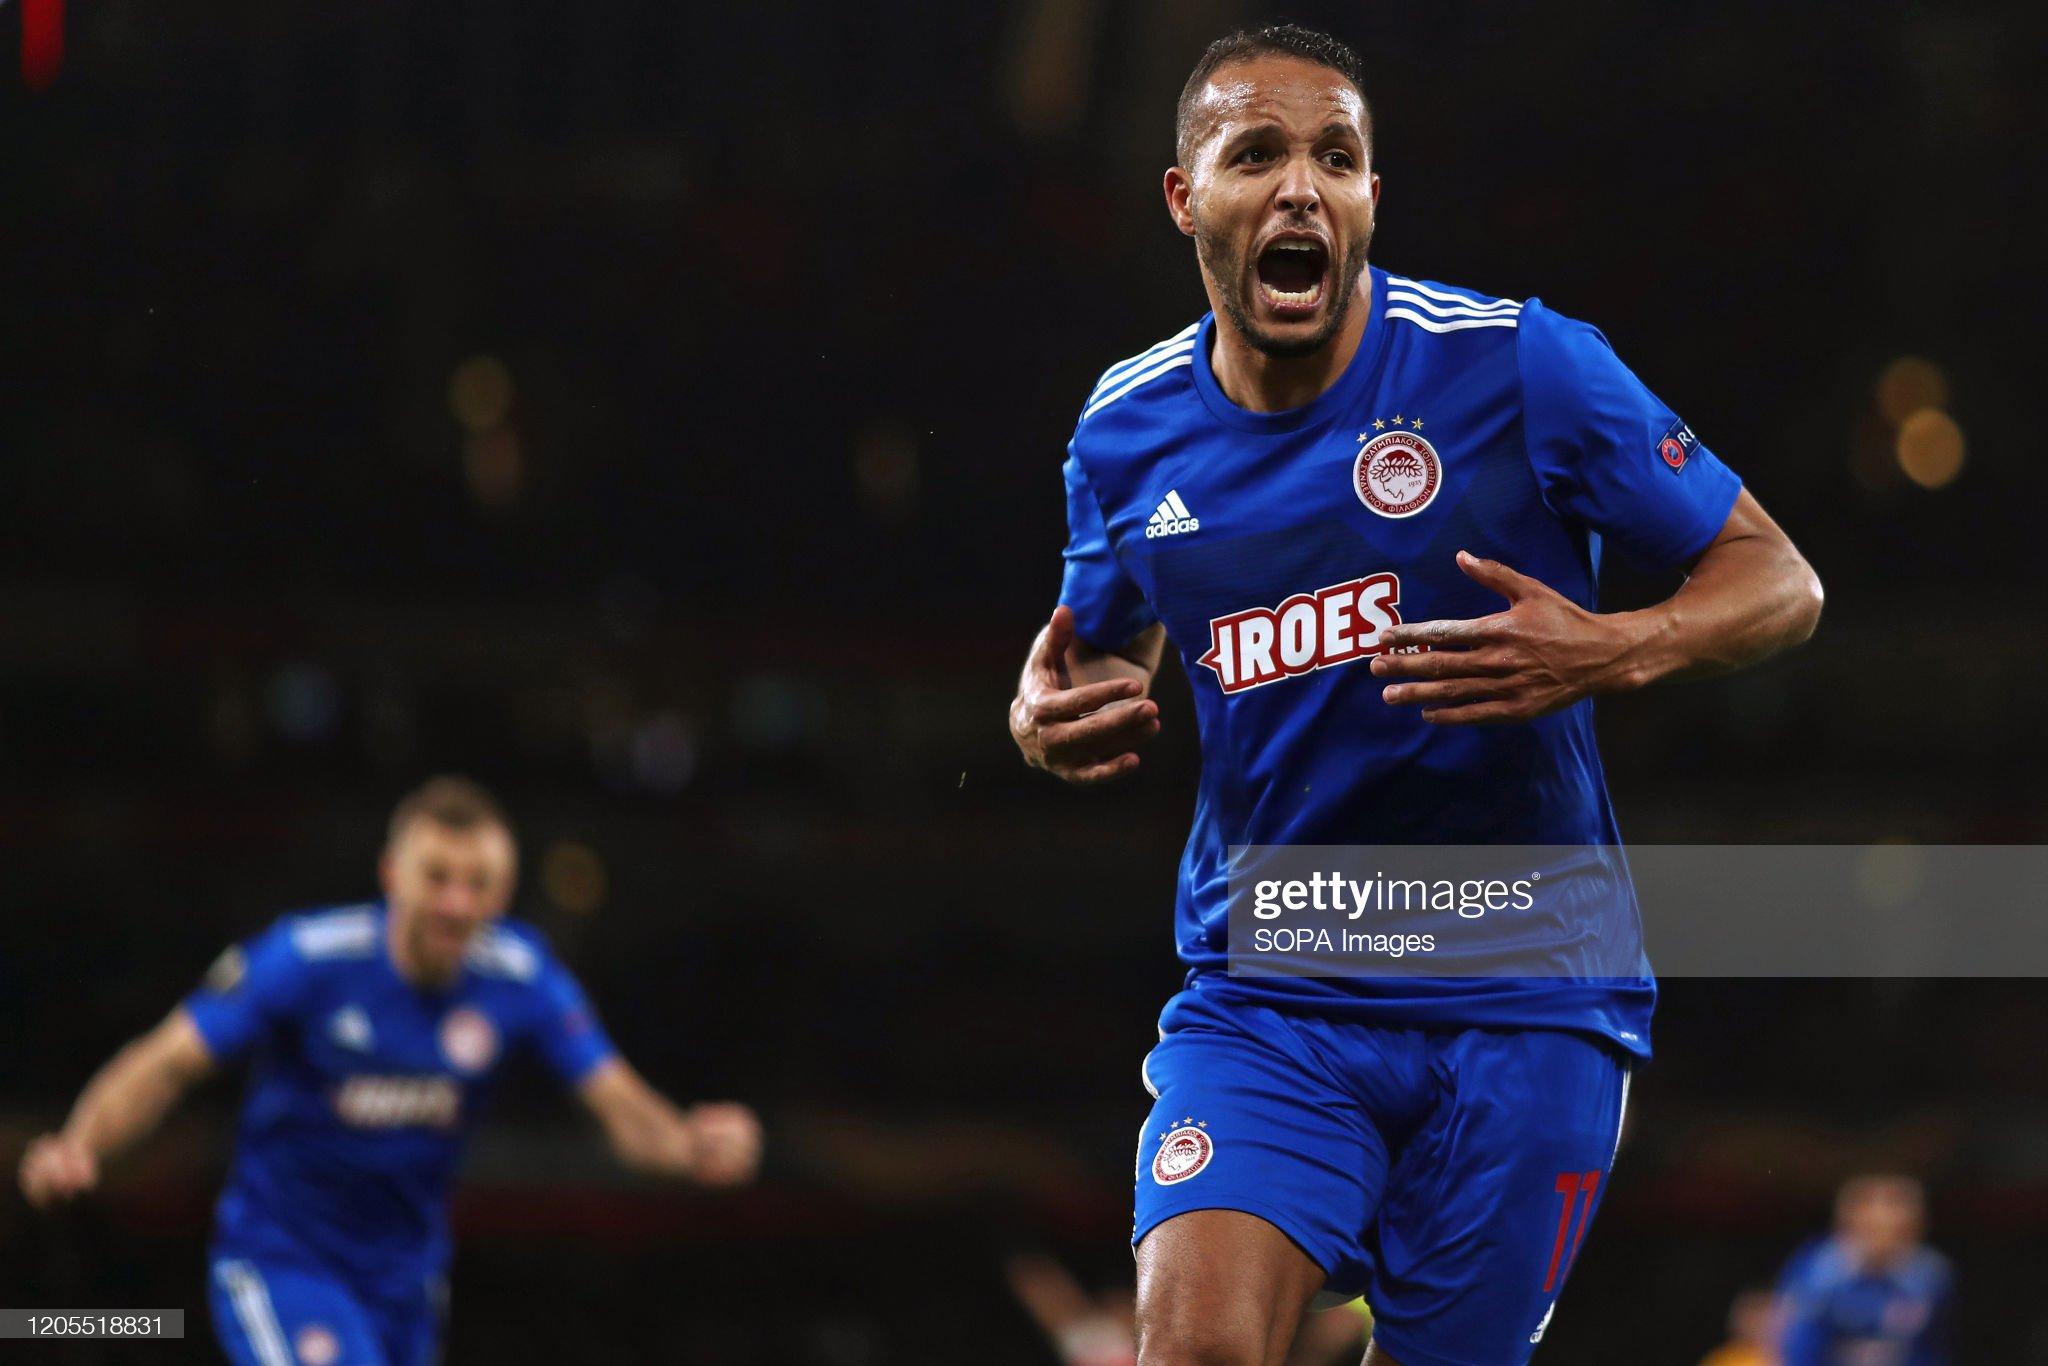 Youssef El Arabi do Olympiacos comemora após marcar um ...: Foto de Notícias